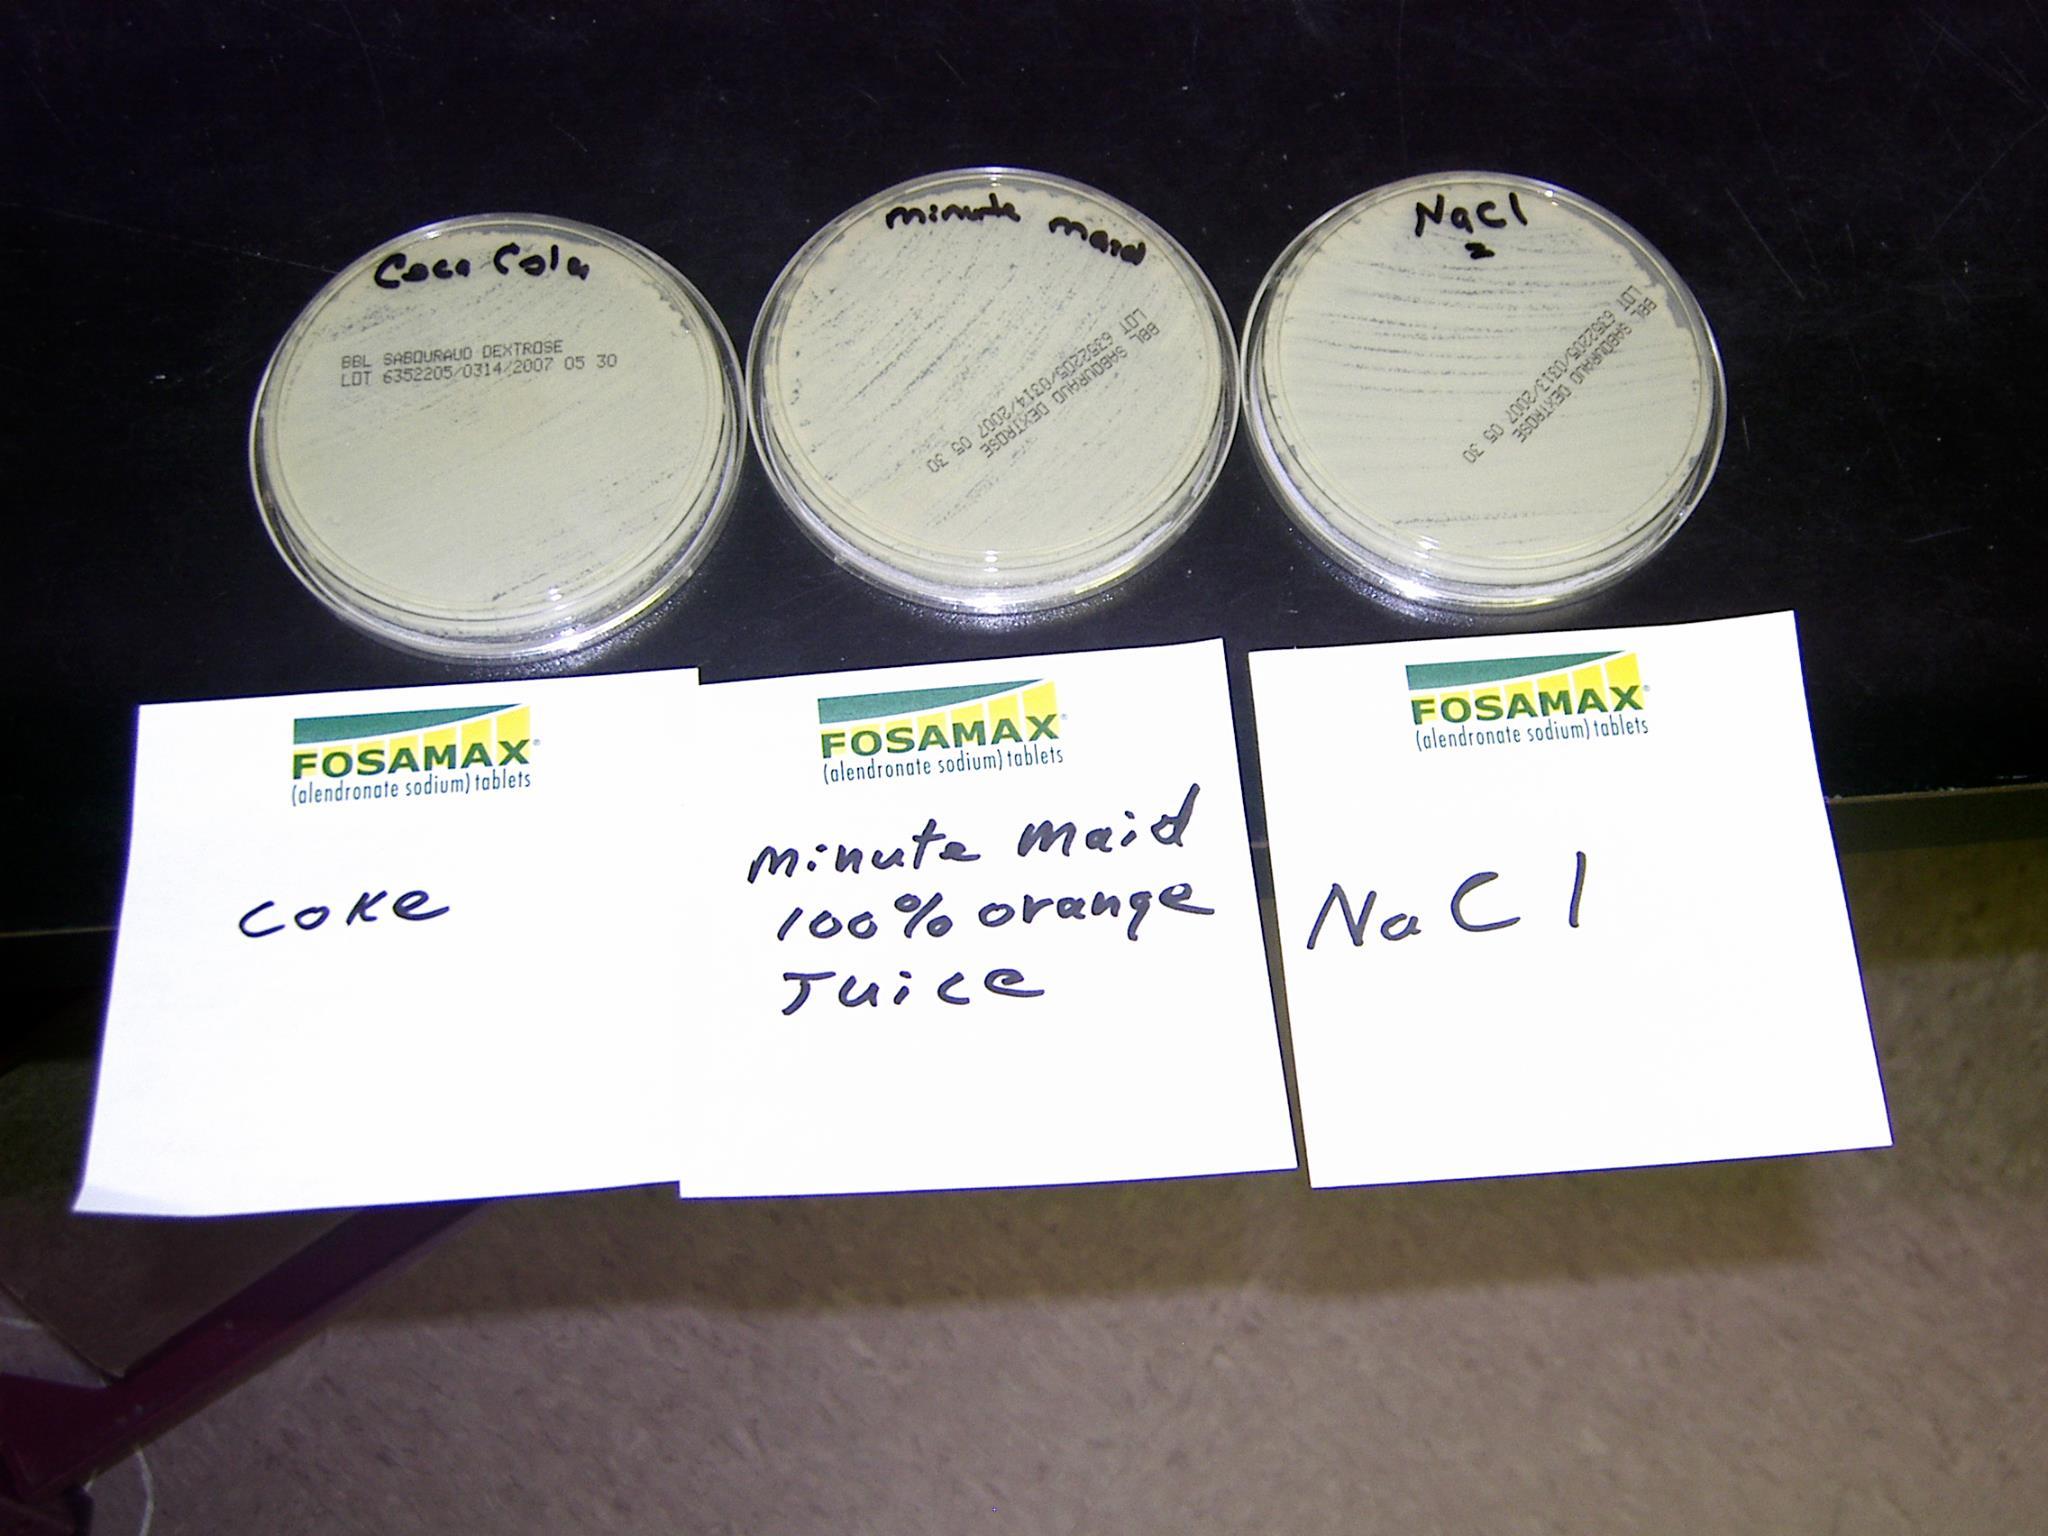 Petri – Coke vs Orange Juice vs Sodium Chloride